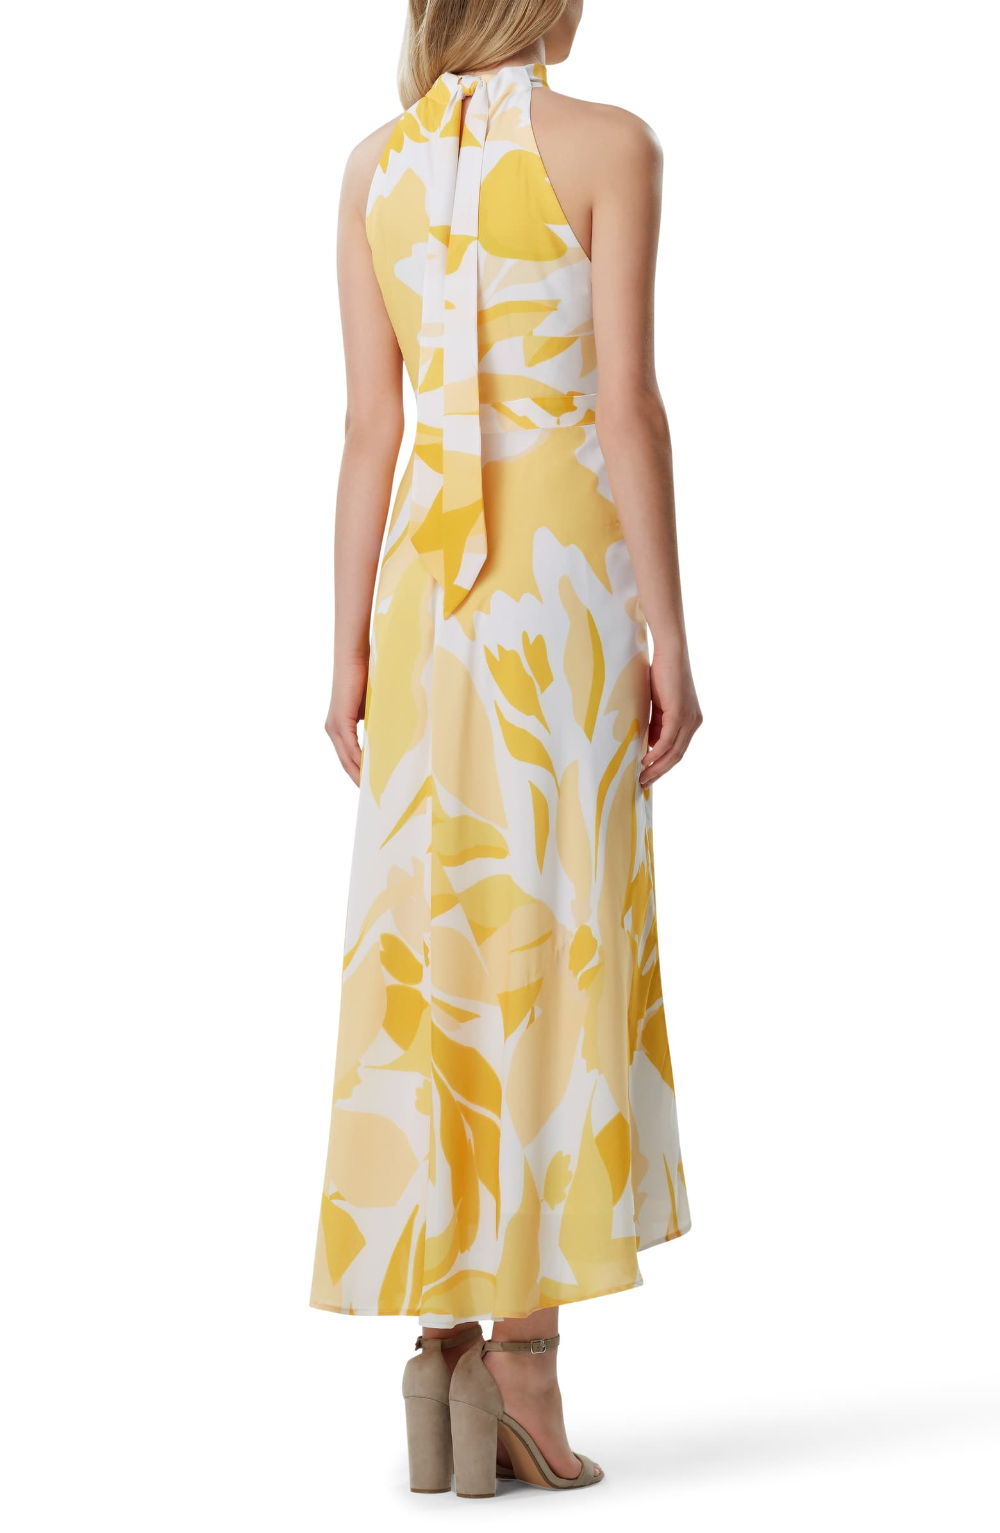 Tahari Printed Halter Maxi Dress Nordstrom Maxi Dress Dresses Printed Maxi Dress [ 1533 x 1000 Pixel ]